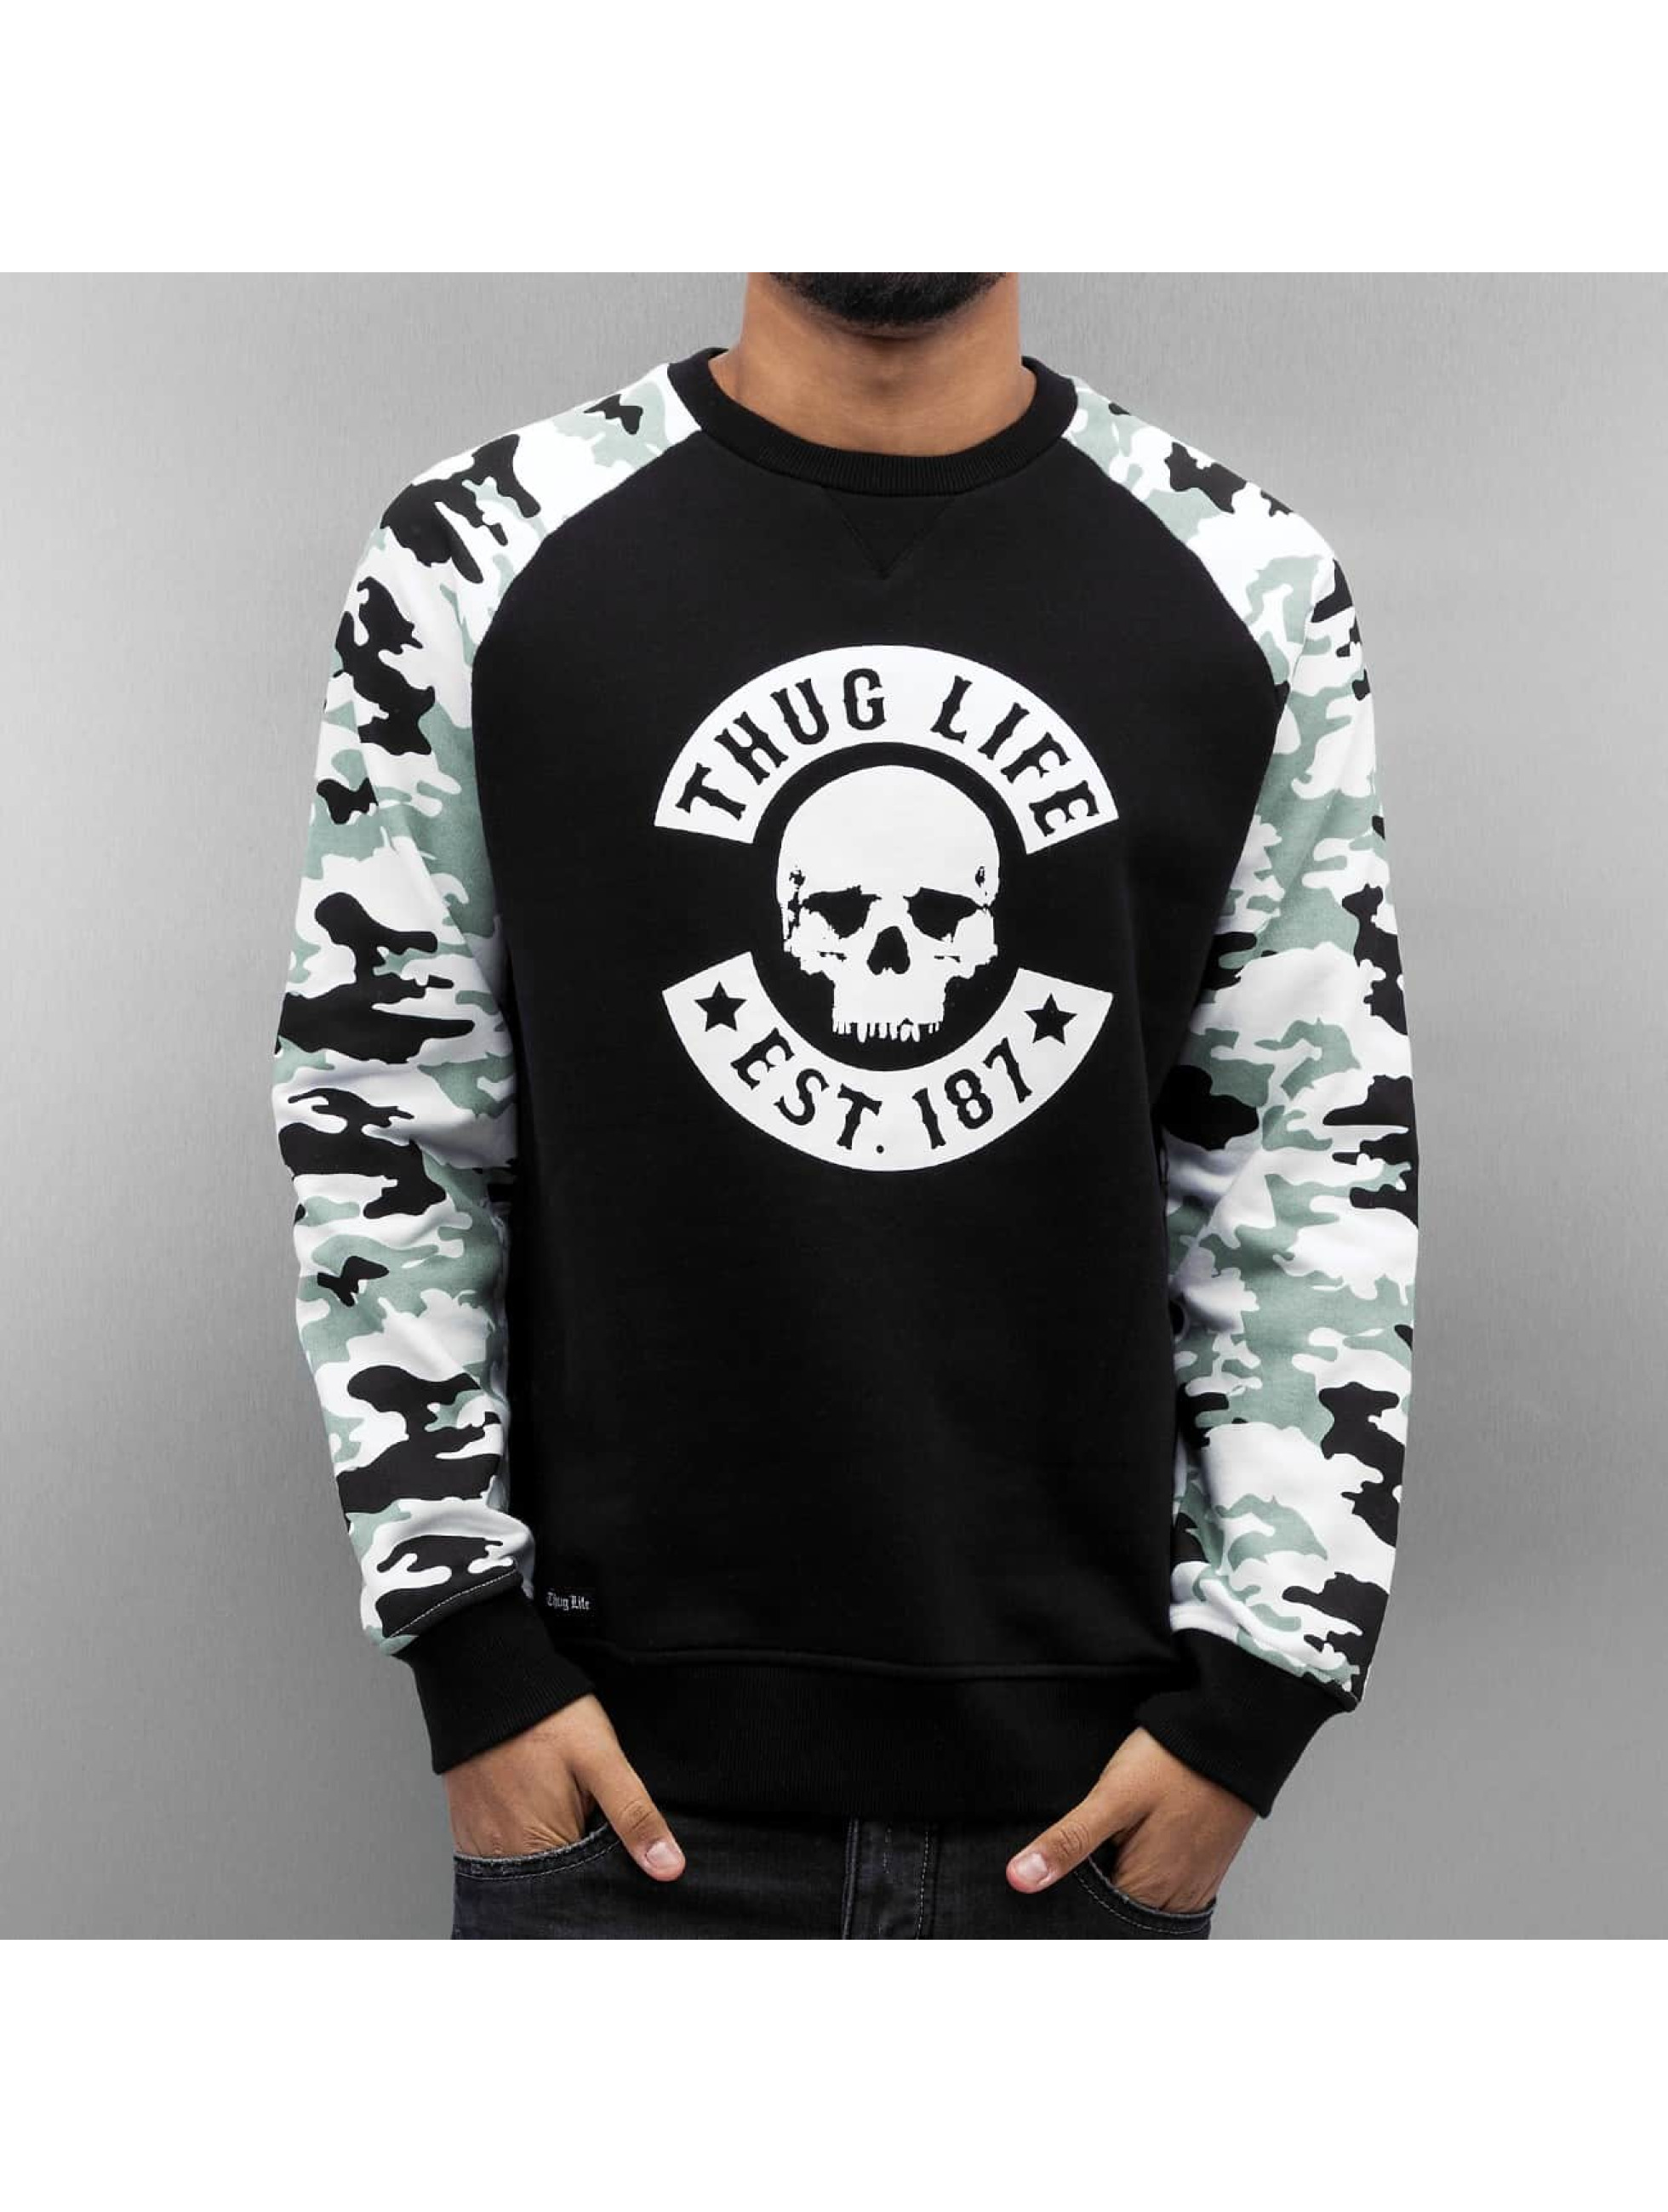 Thug Life Pullover Ragthug schwarz